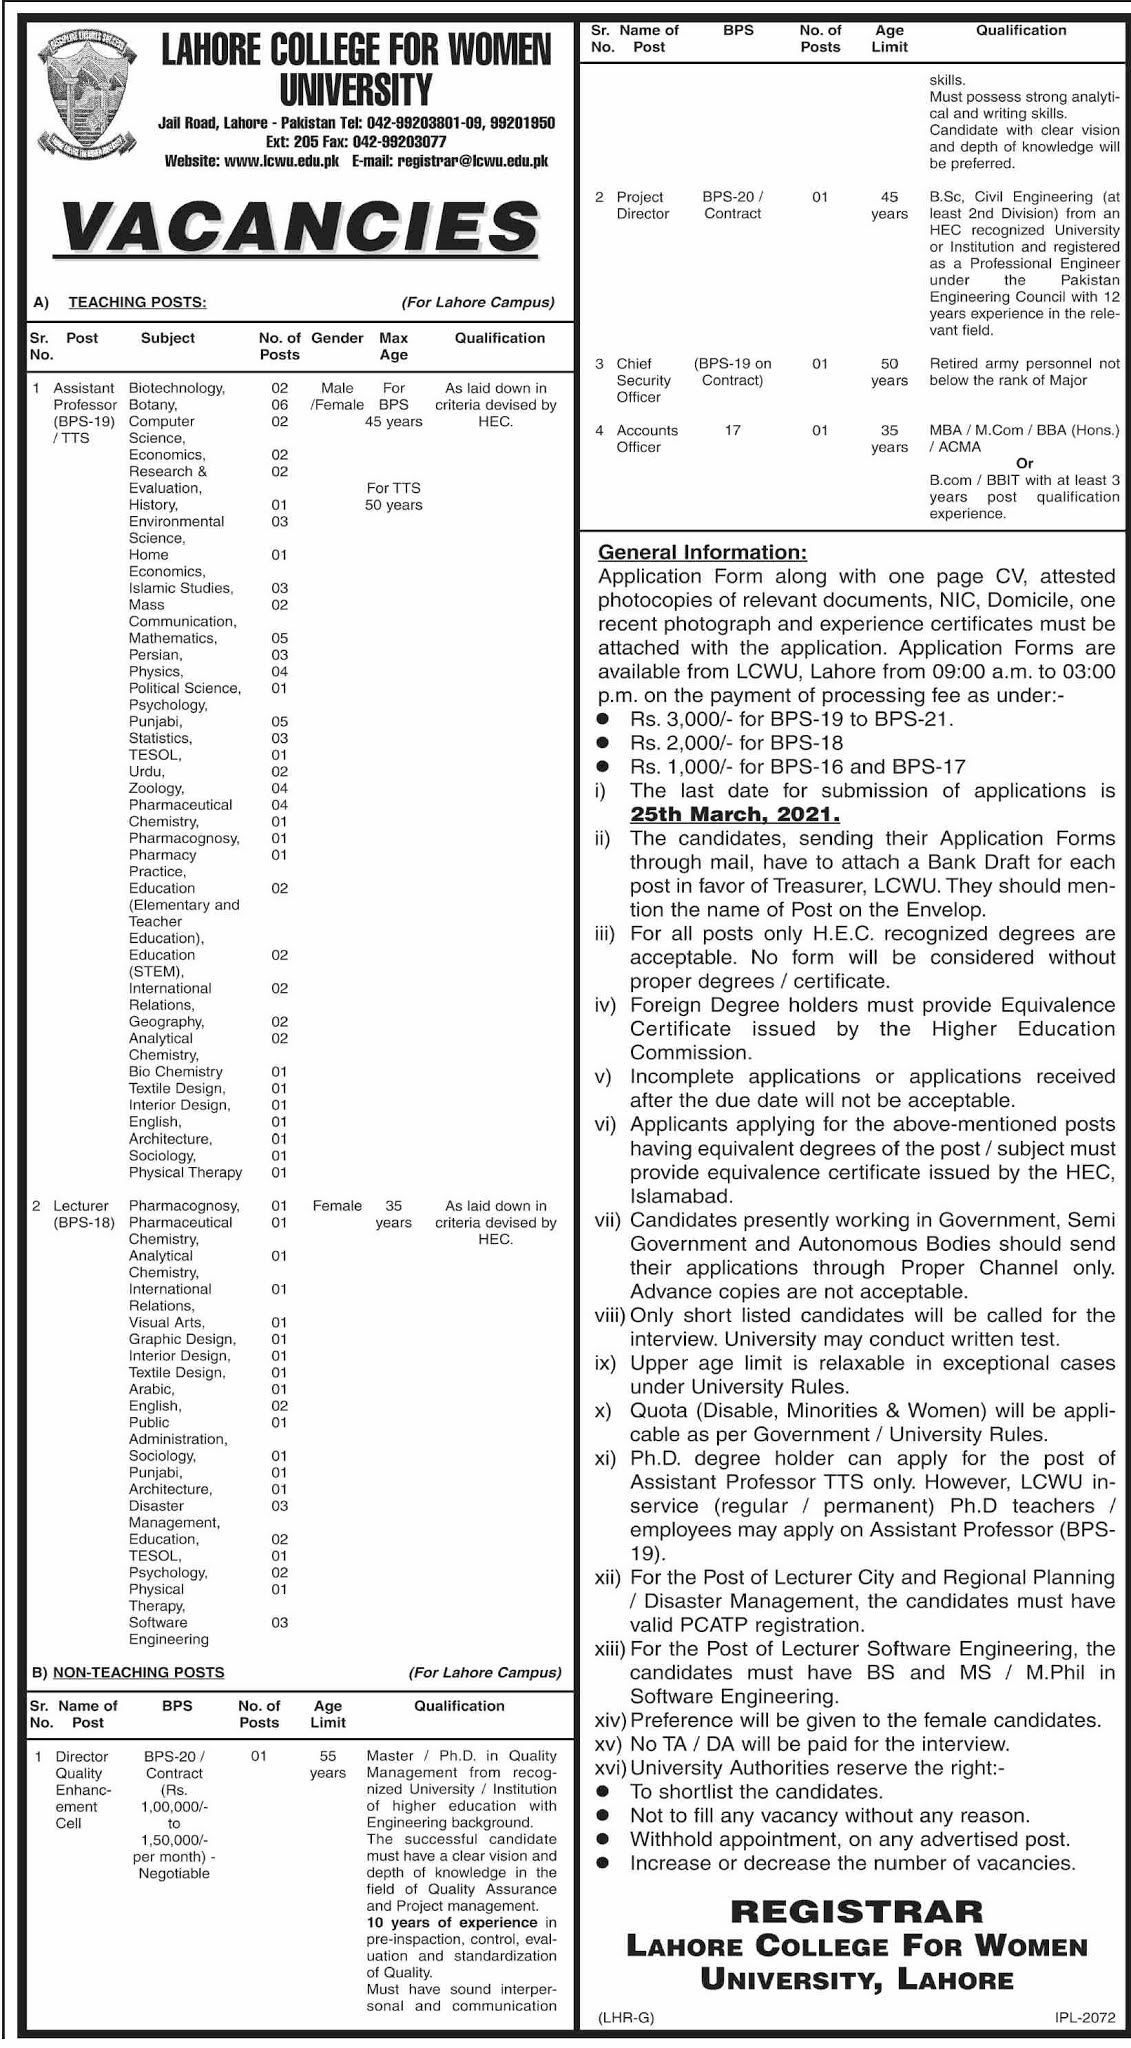 http://www.lcwu.edu.pk/lcwu-career.html - Download Job Application and Challan Form - LCWU Jobs 2021 - Lahore College For Women University Jobs 2021 - www.lcwu.edu.pk - registrar@lcwu.edu.pk